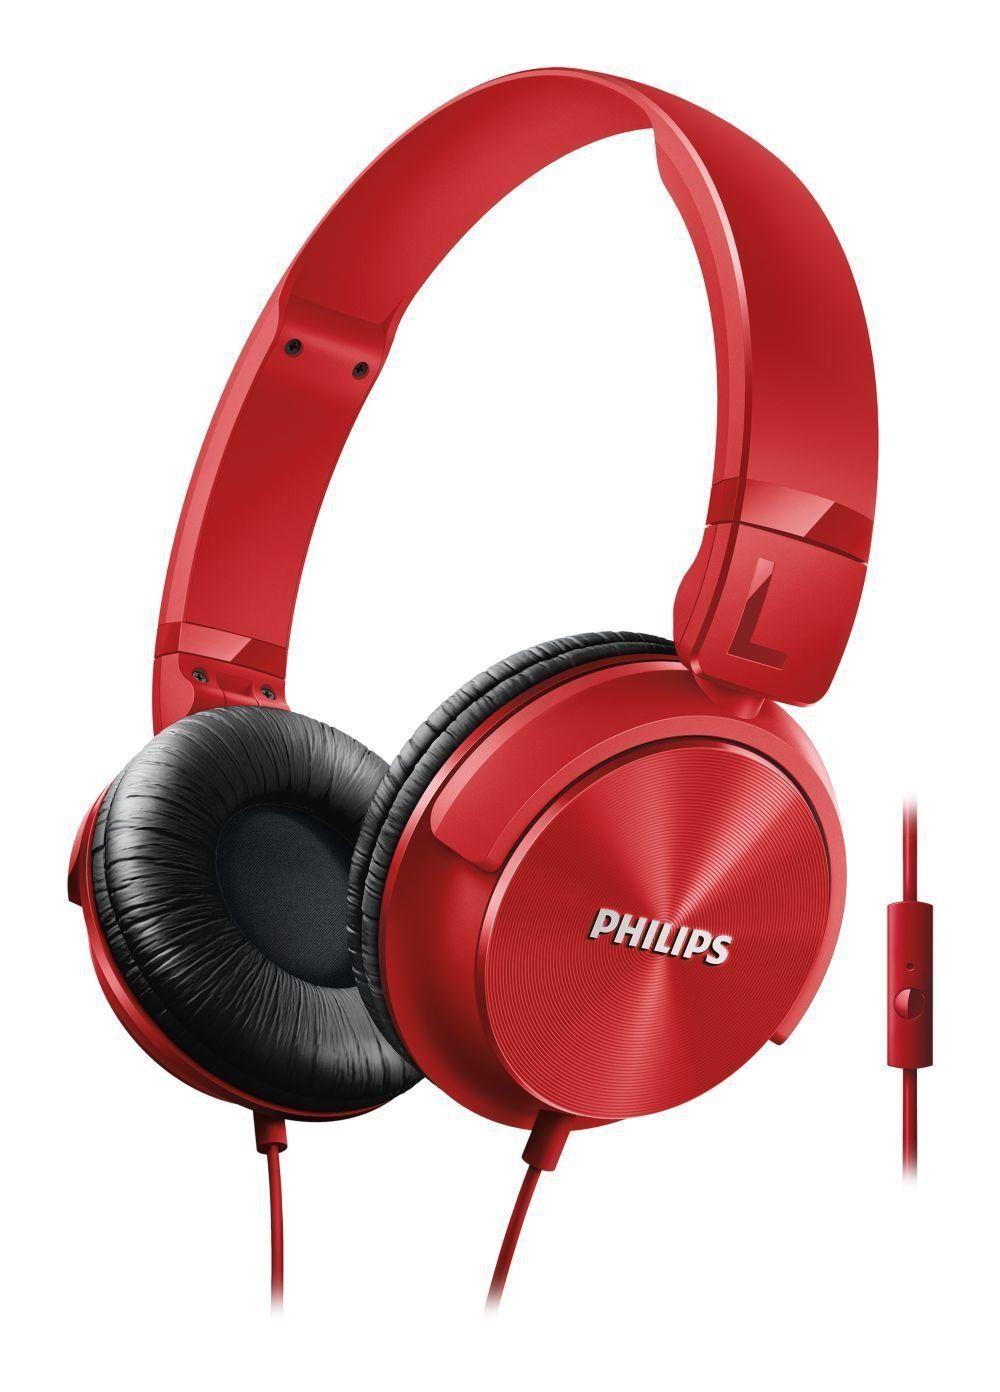 Philips Headphones - Review